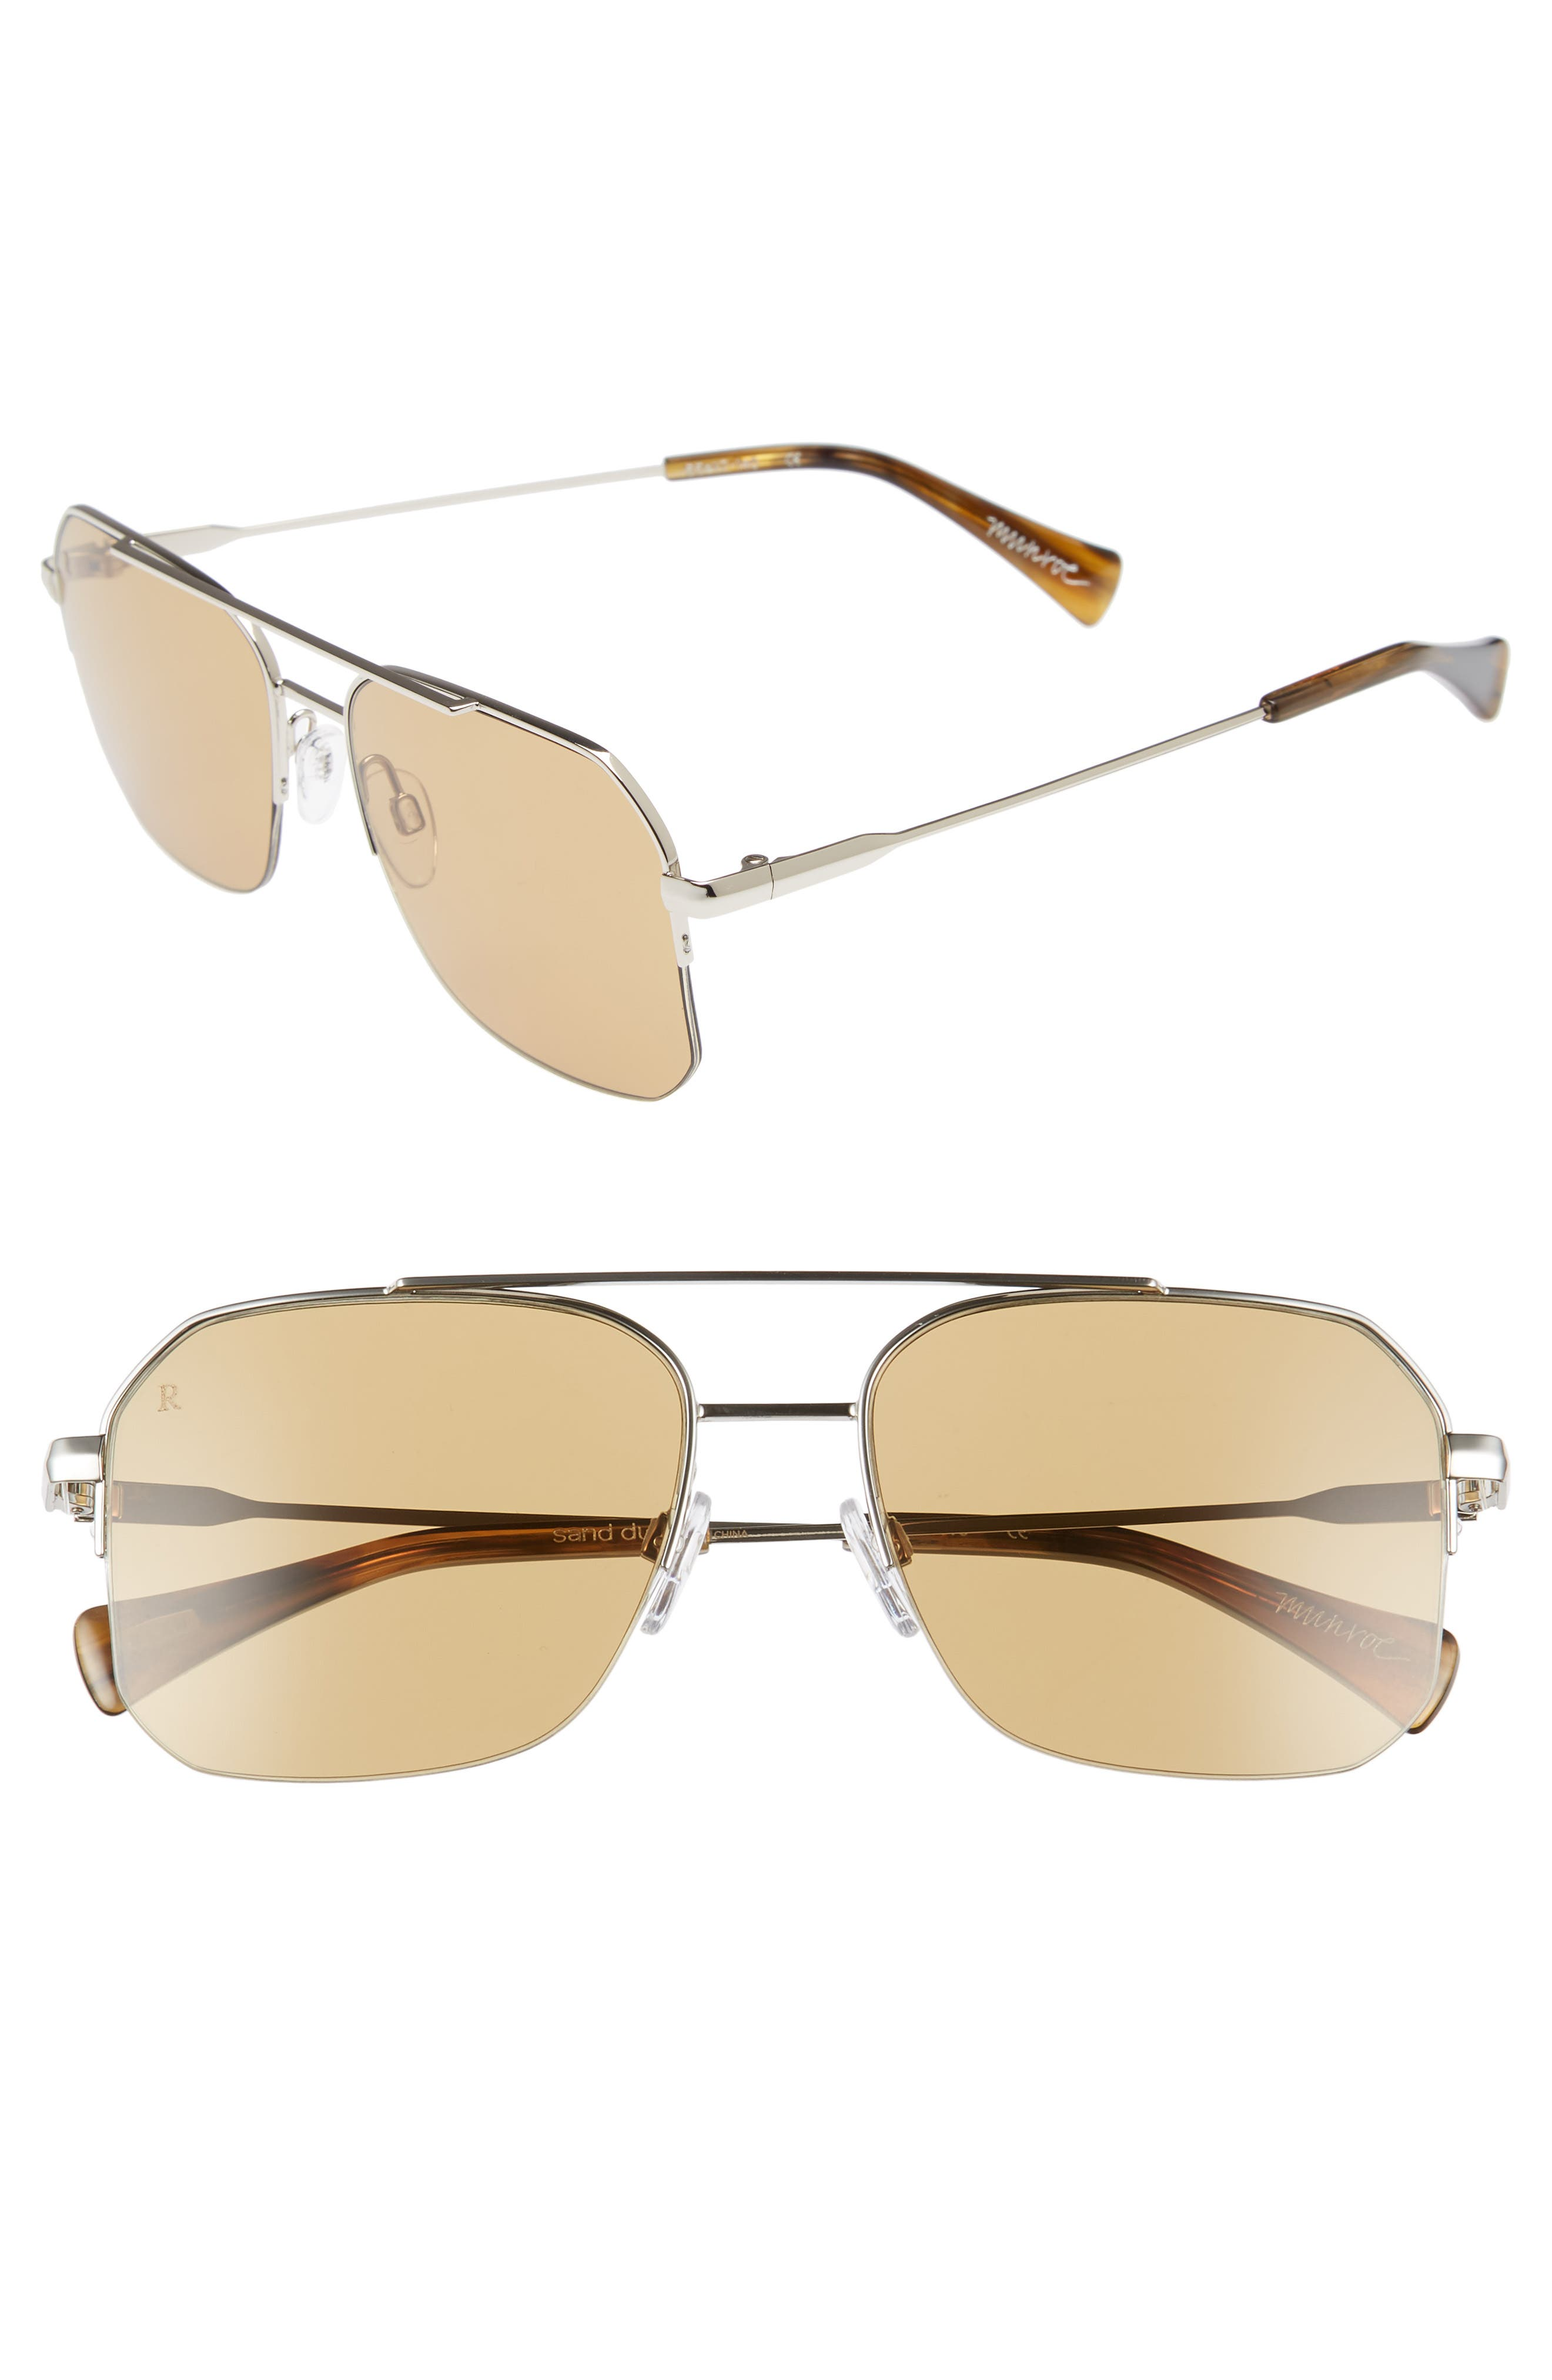 Munroe 55mm Square Aviator Sunglasses,                             Main thumbnail 1, color,                             SAND DUNE